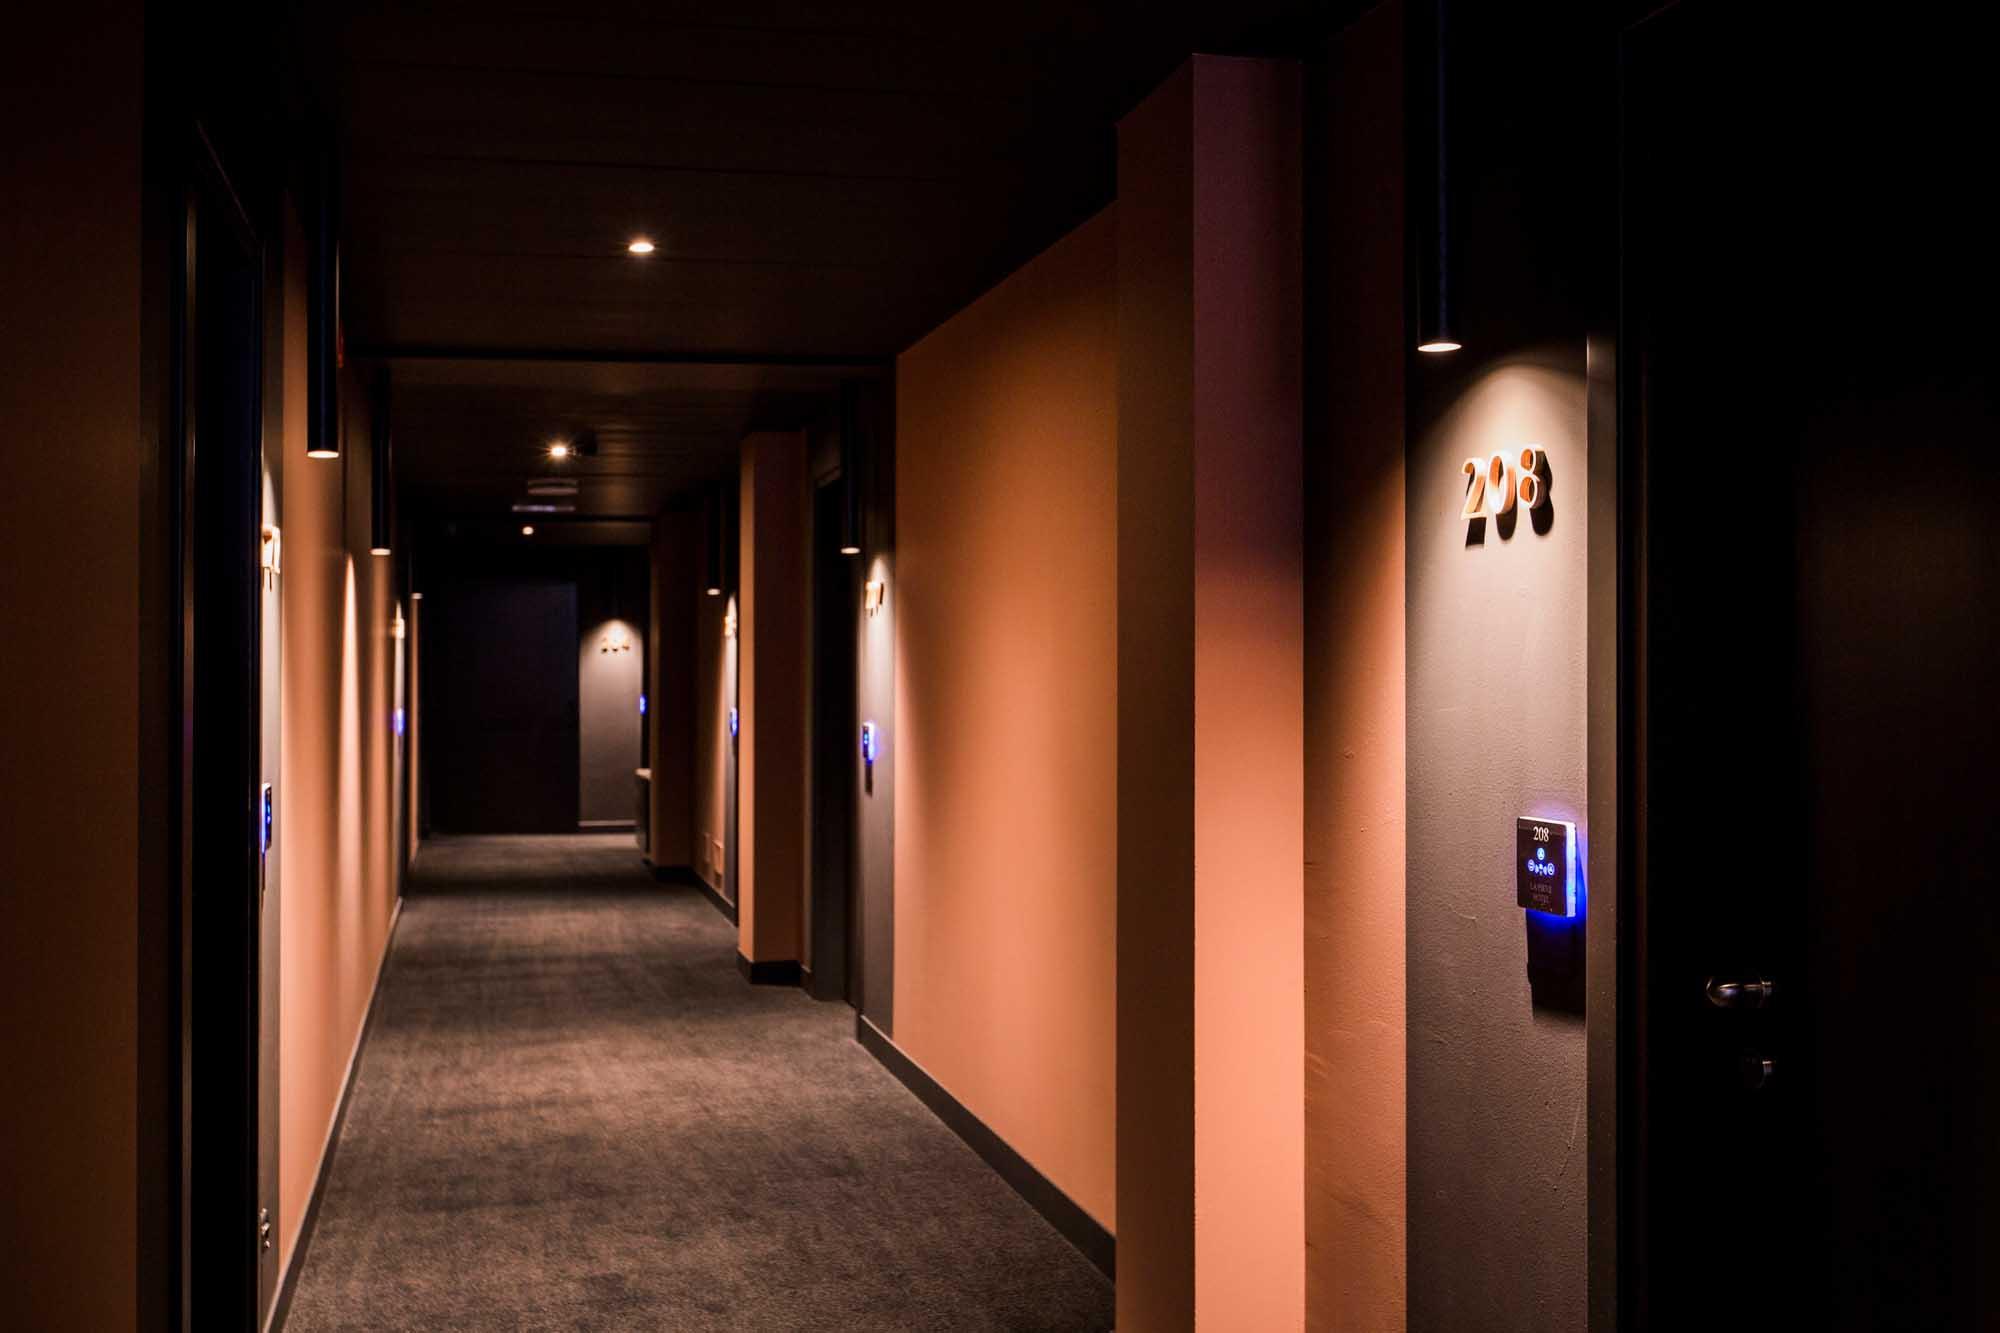 OLEV_lampada_LED_plafoniera_soffitto_hotel_PIPE_hotel_pieve (1)